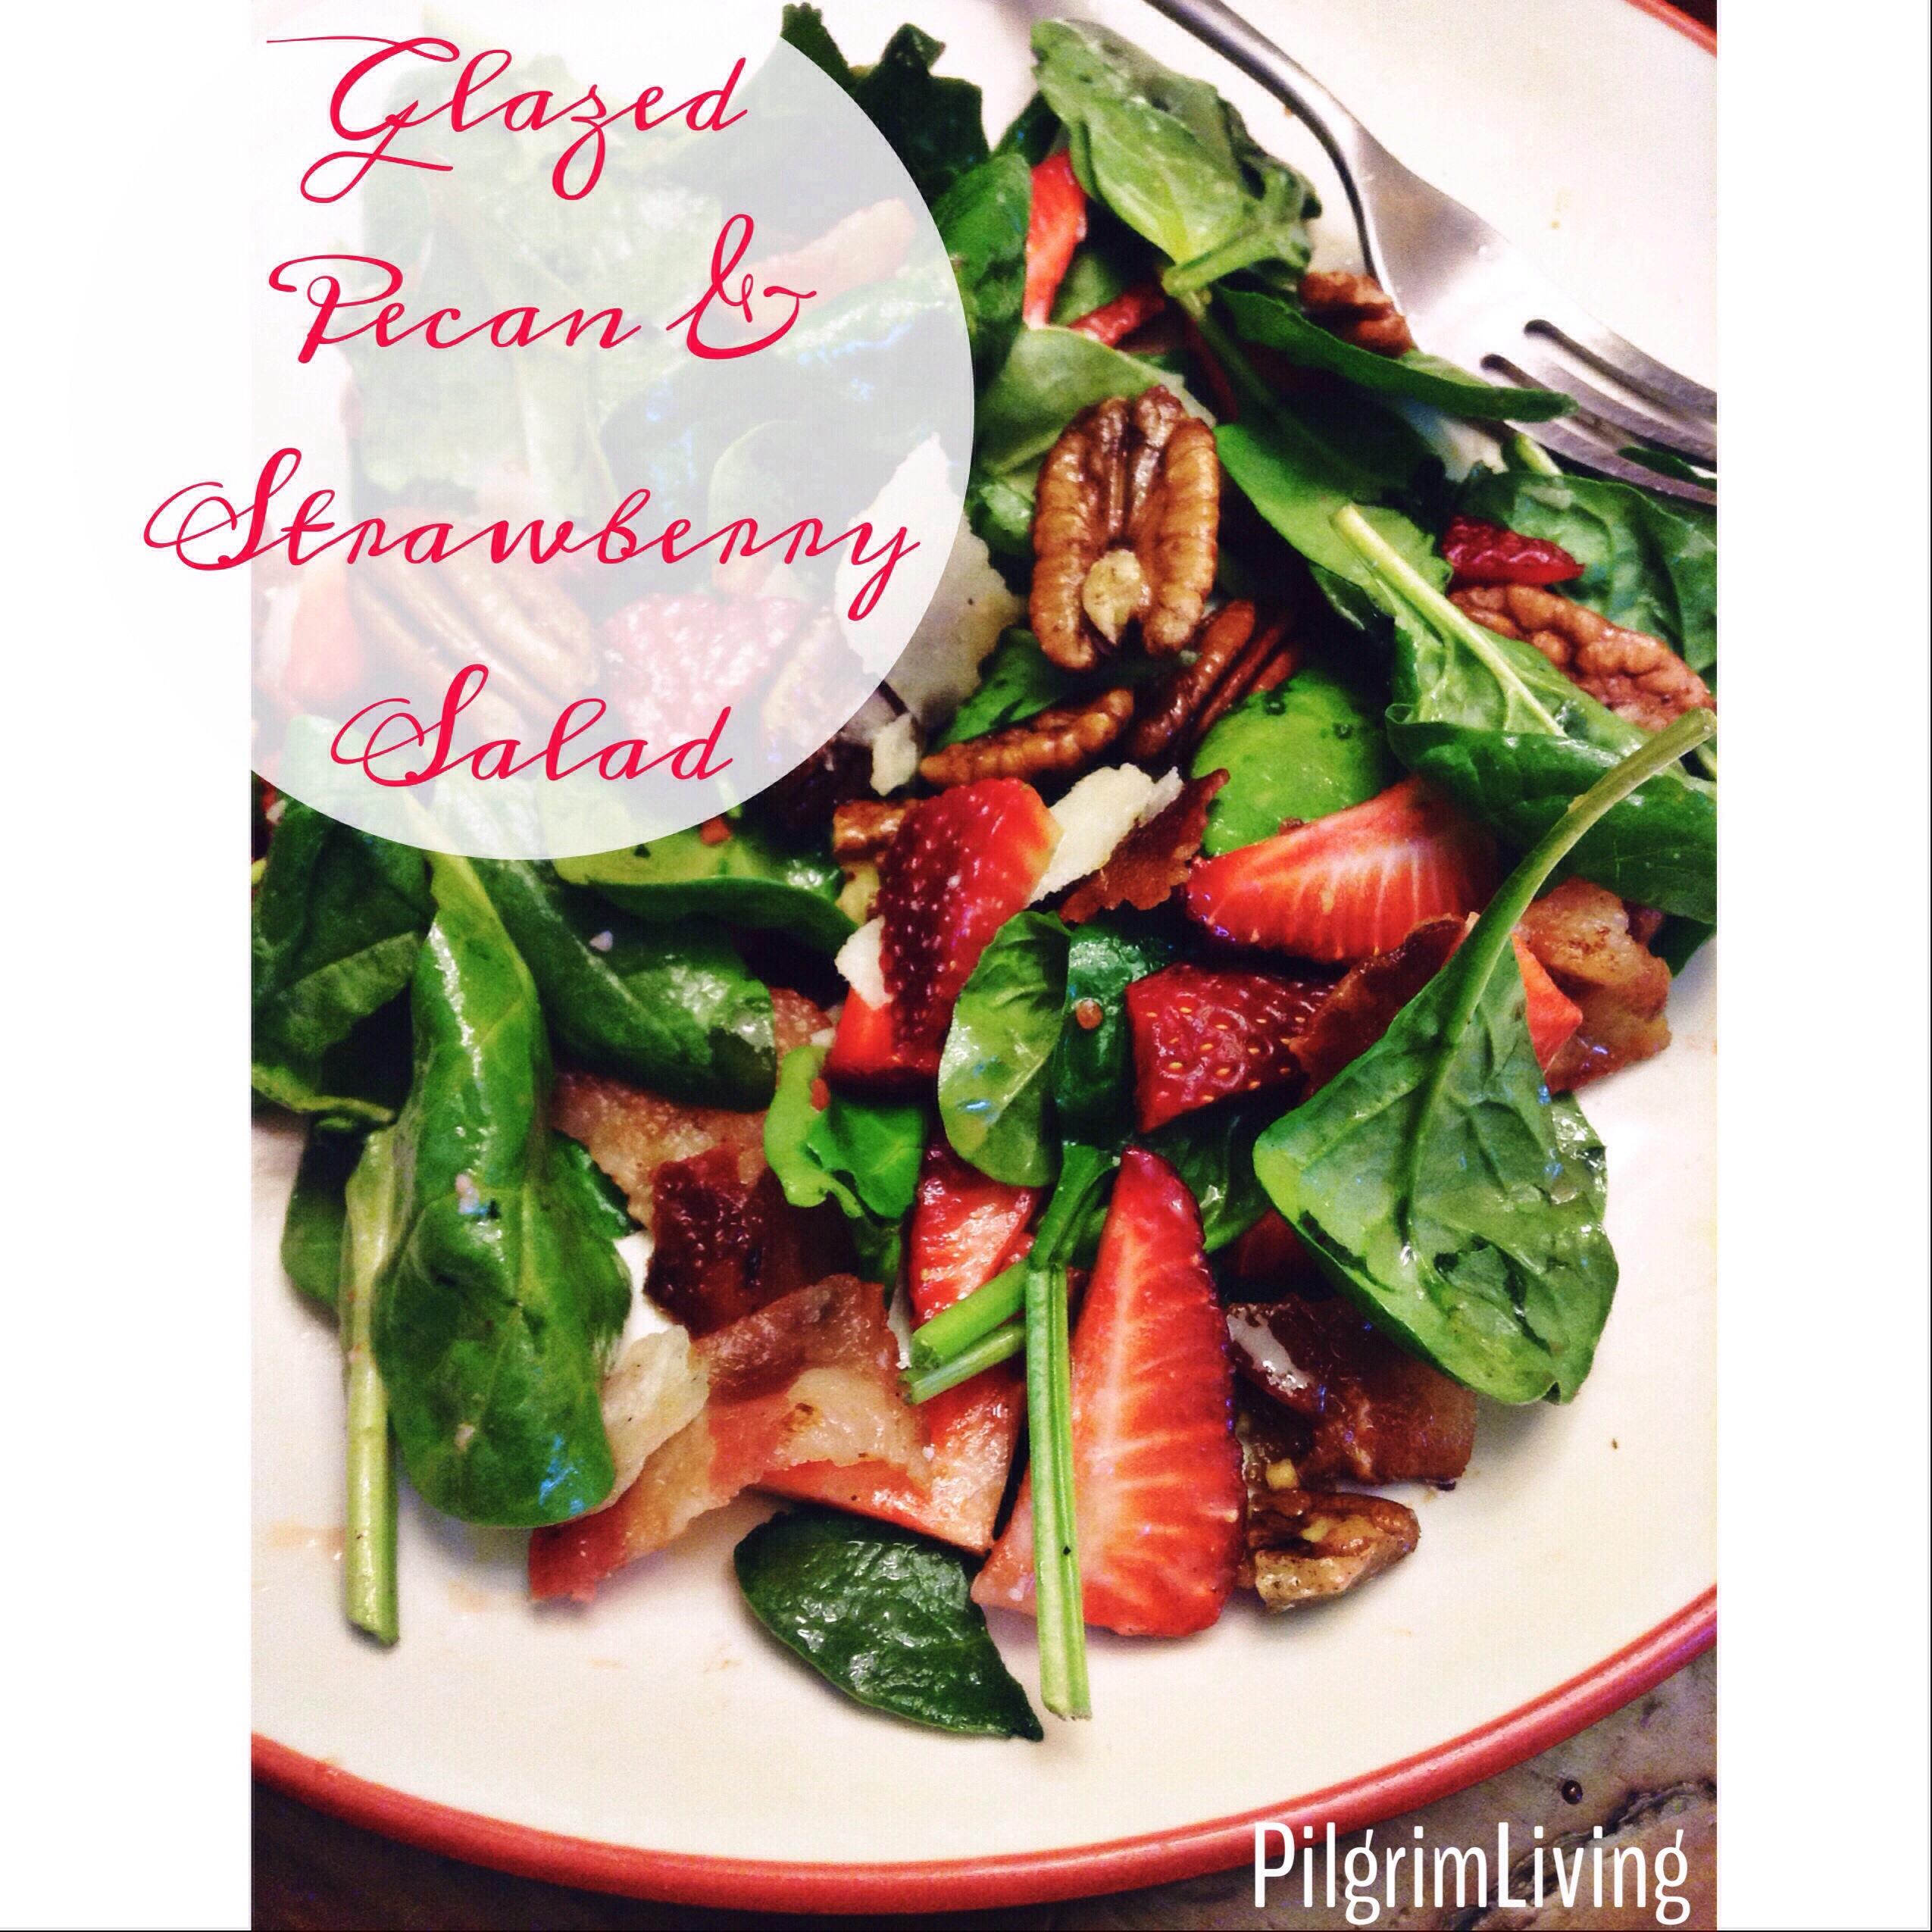 Glazed Pecan & Strawberry Salad